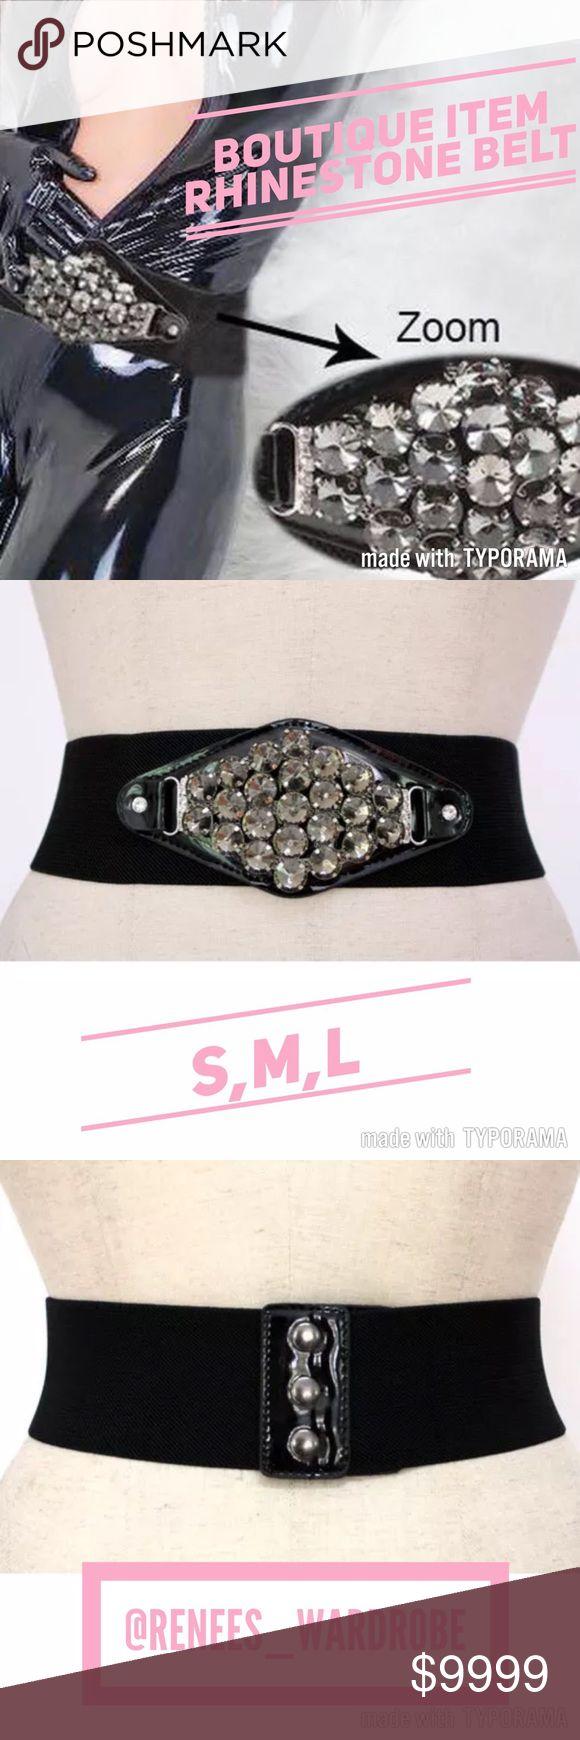 🍭Rhinestone Belt fits S,M,L Black rhinestone belt. One size Fits small, medium, large. Boutique item. Accessories Belts